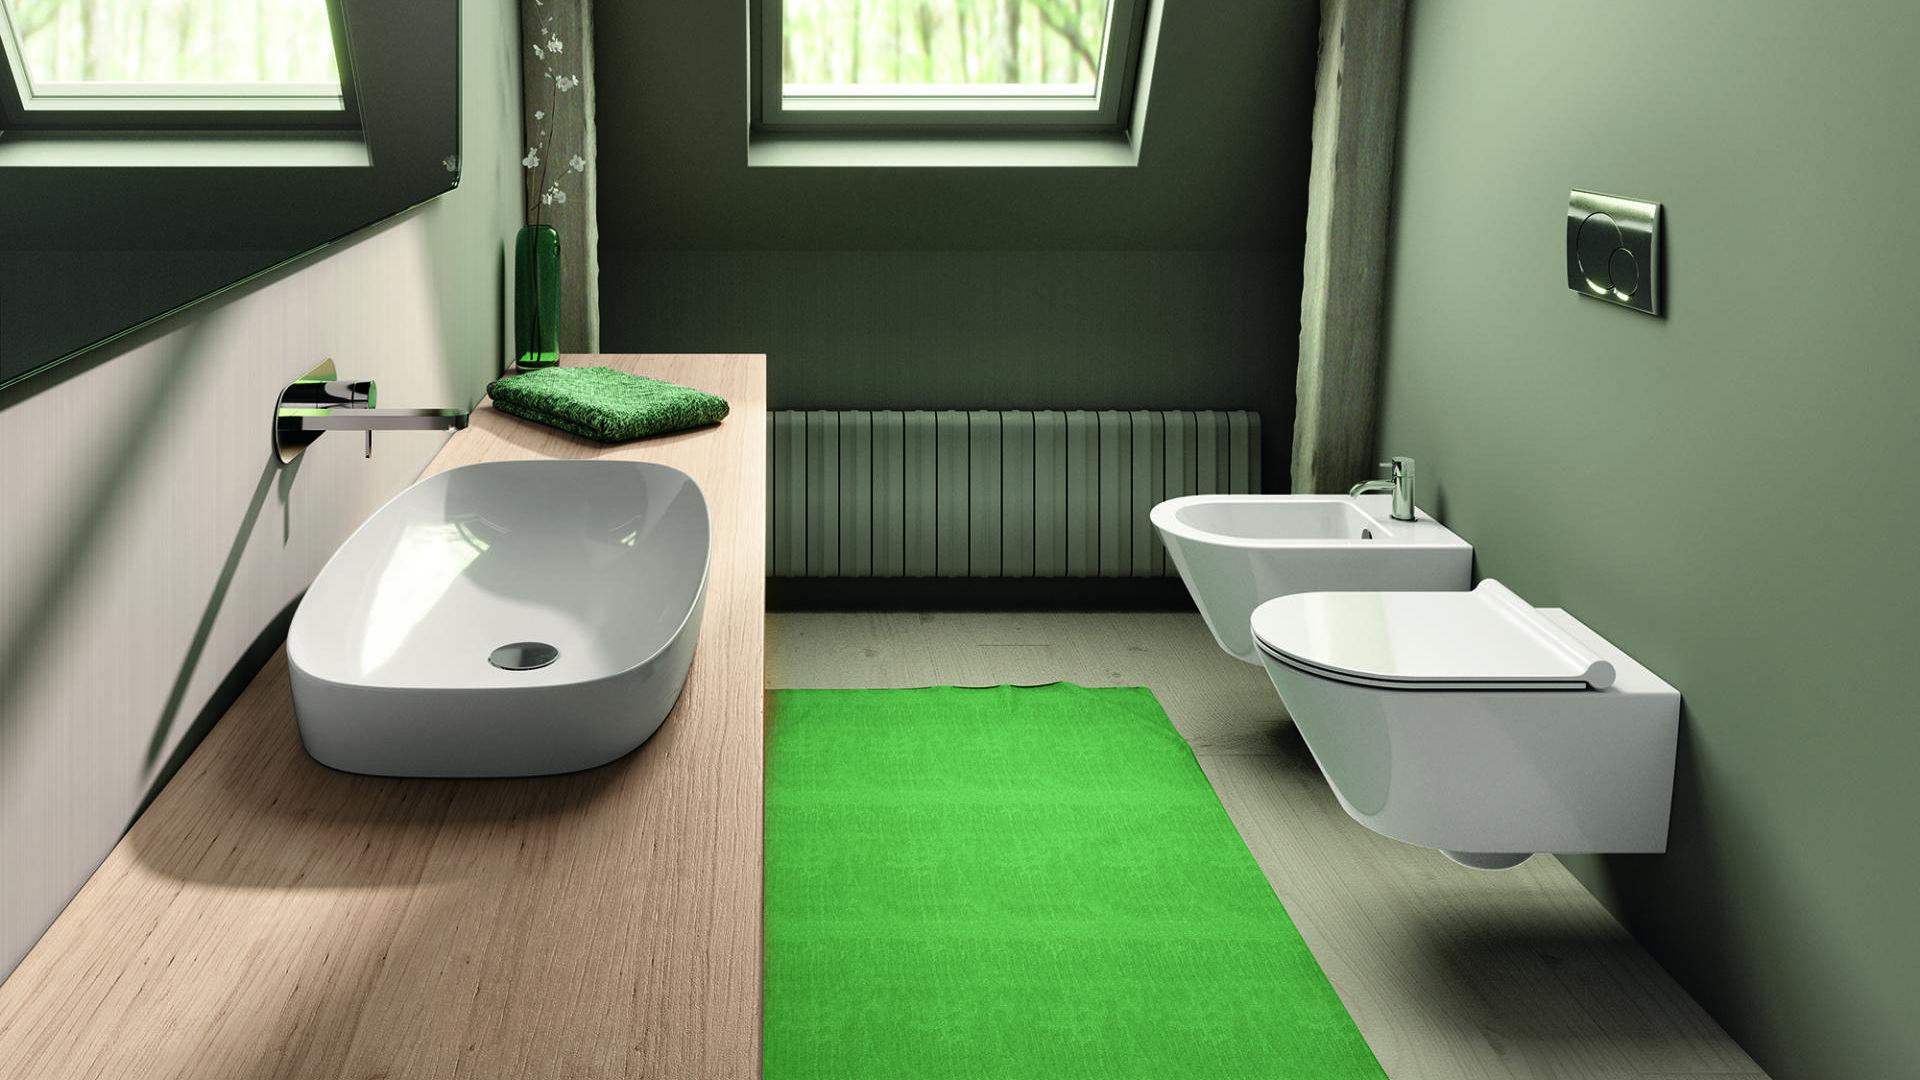 Lavabo Green Lux e sanitari Zero sospesi